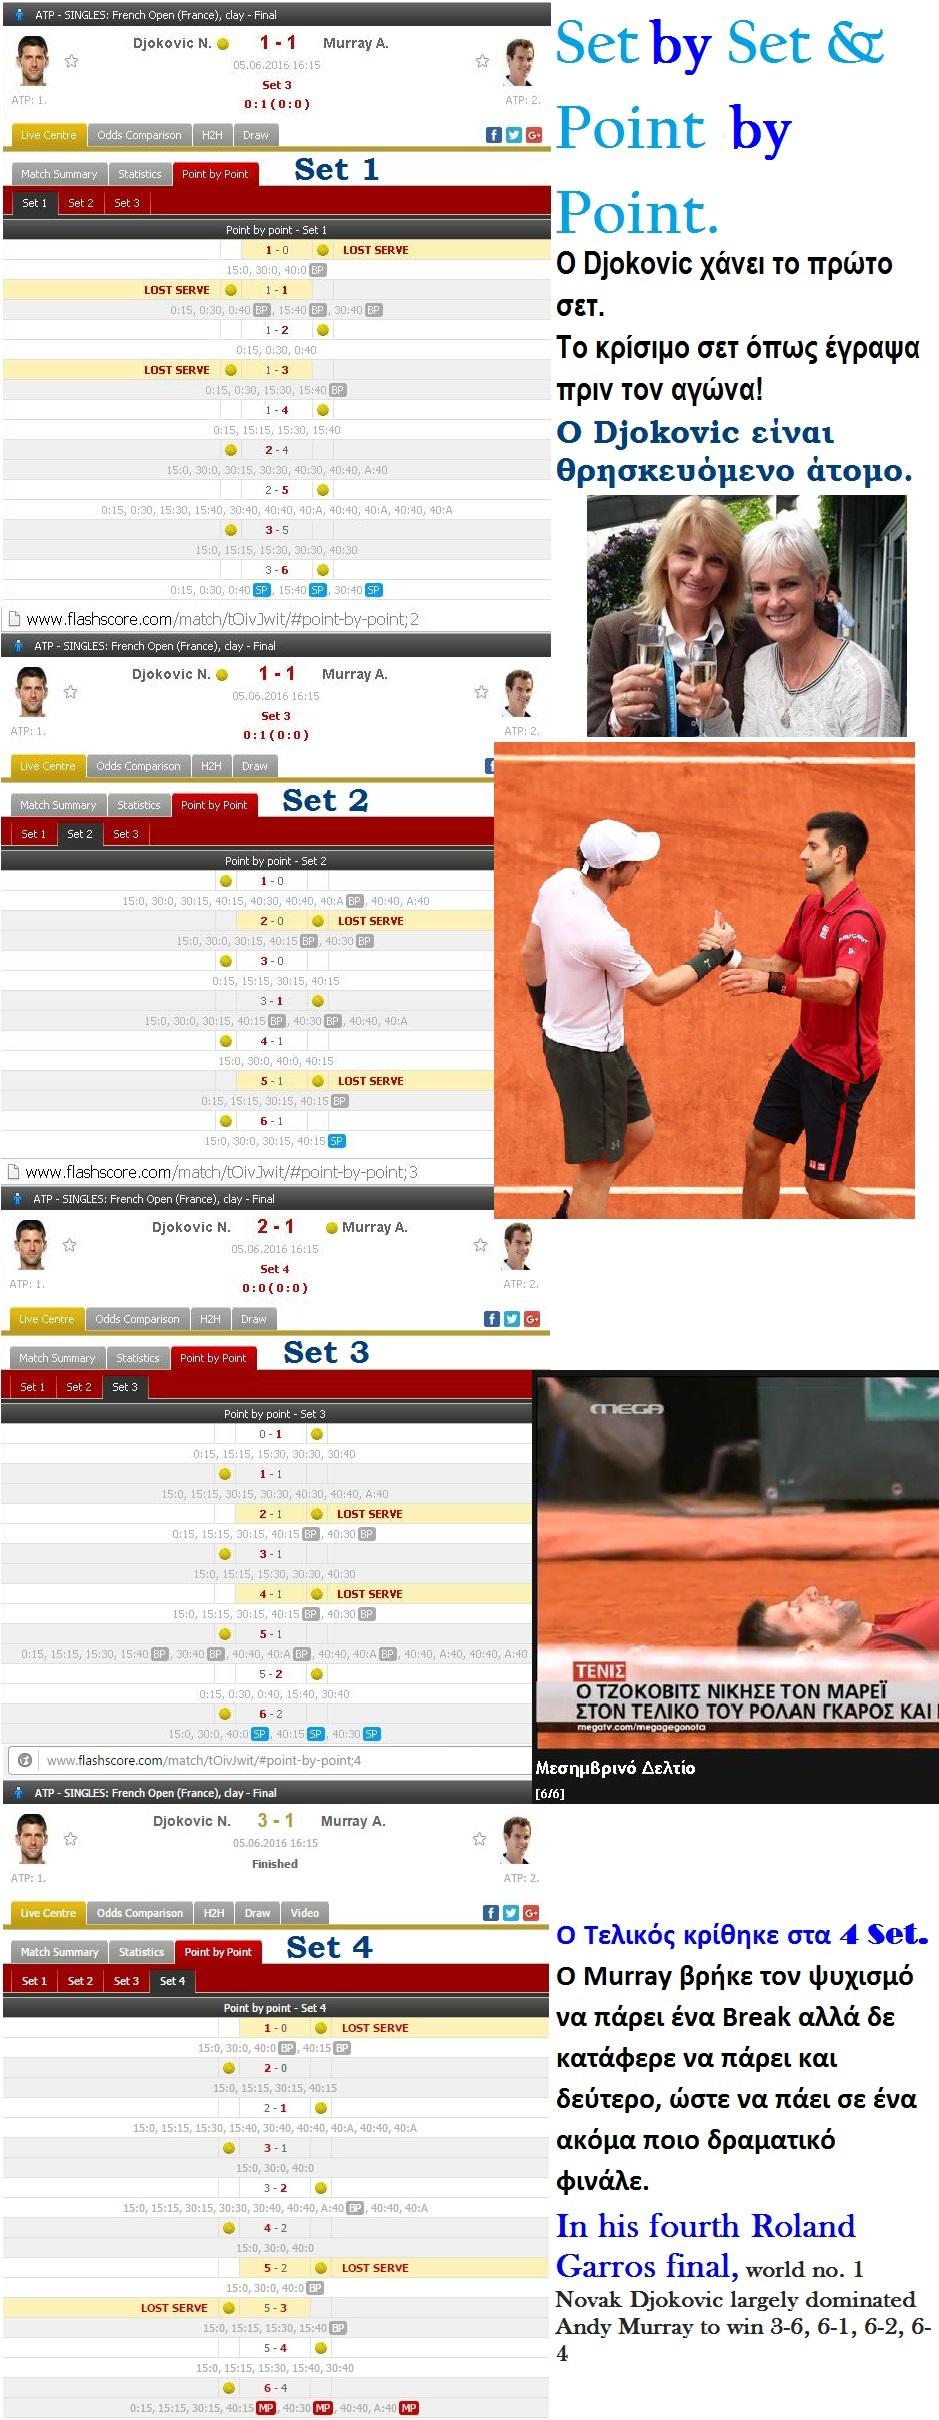 TENNIS GRAND SLAM ROLAND GARROS FINAL DJOKOVIC WIN VS MURRAY 240 060616